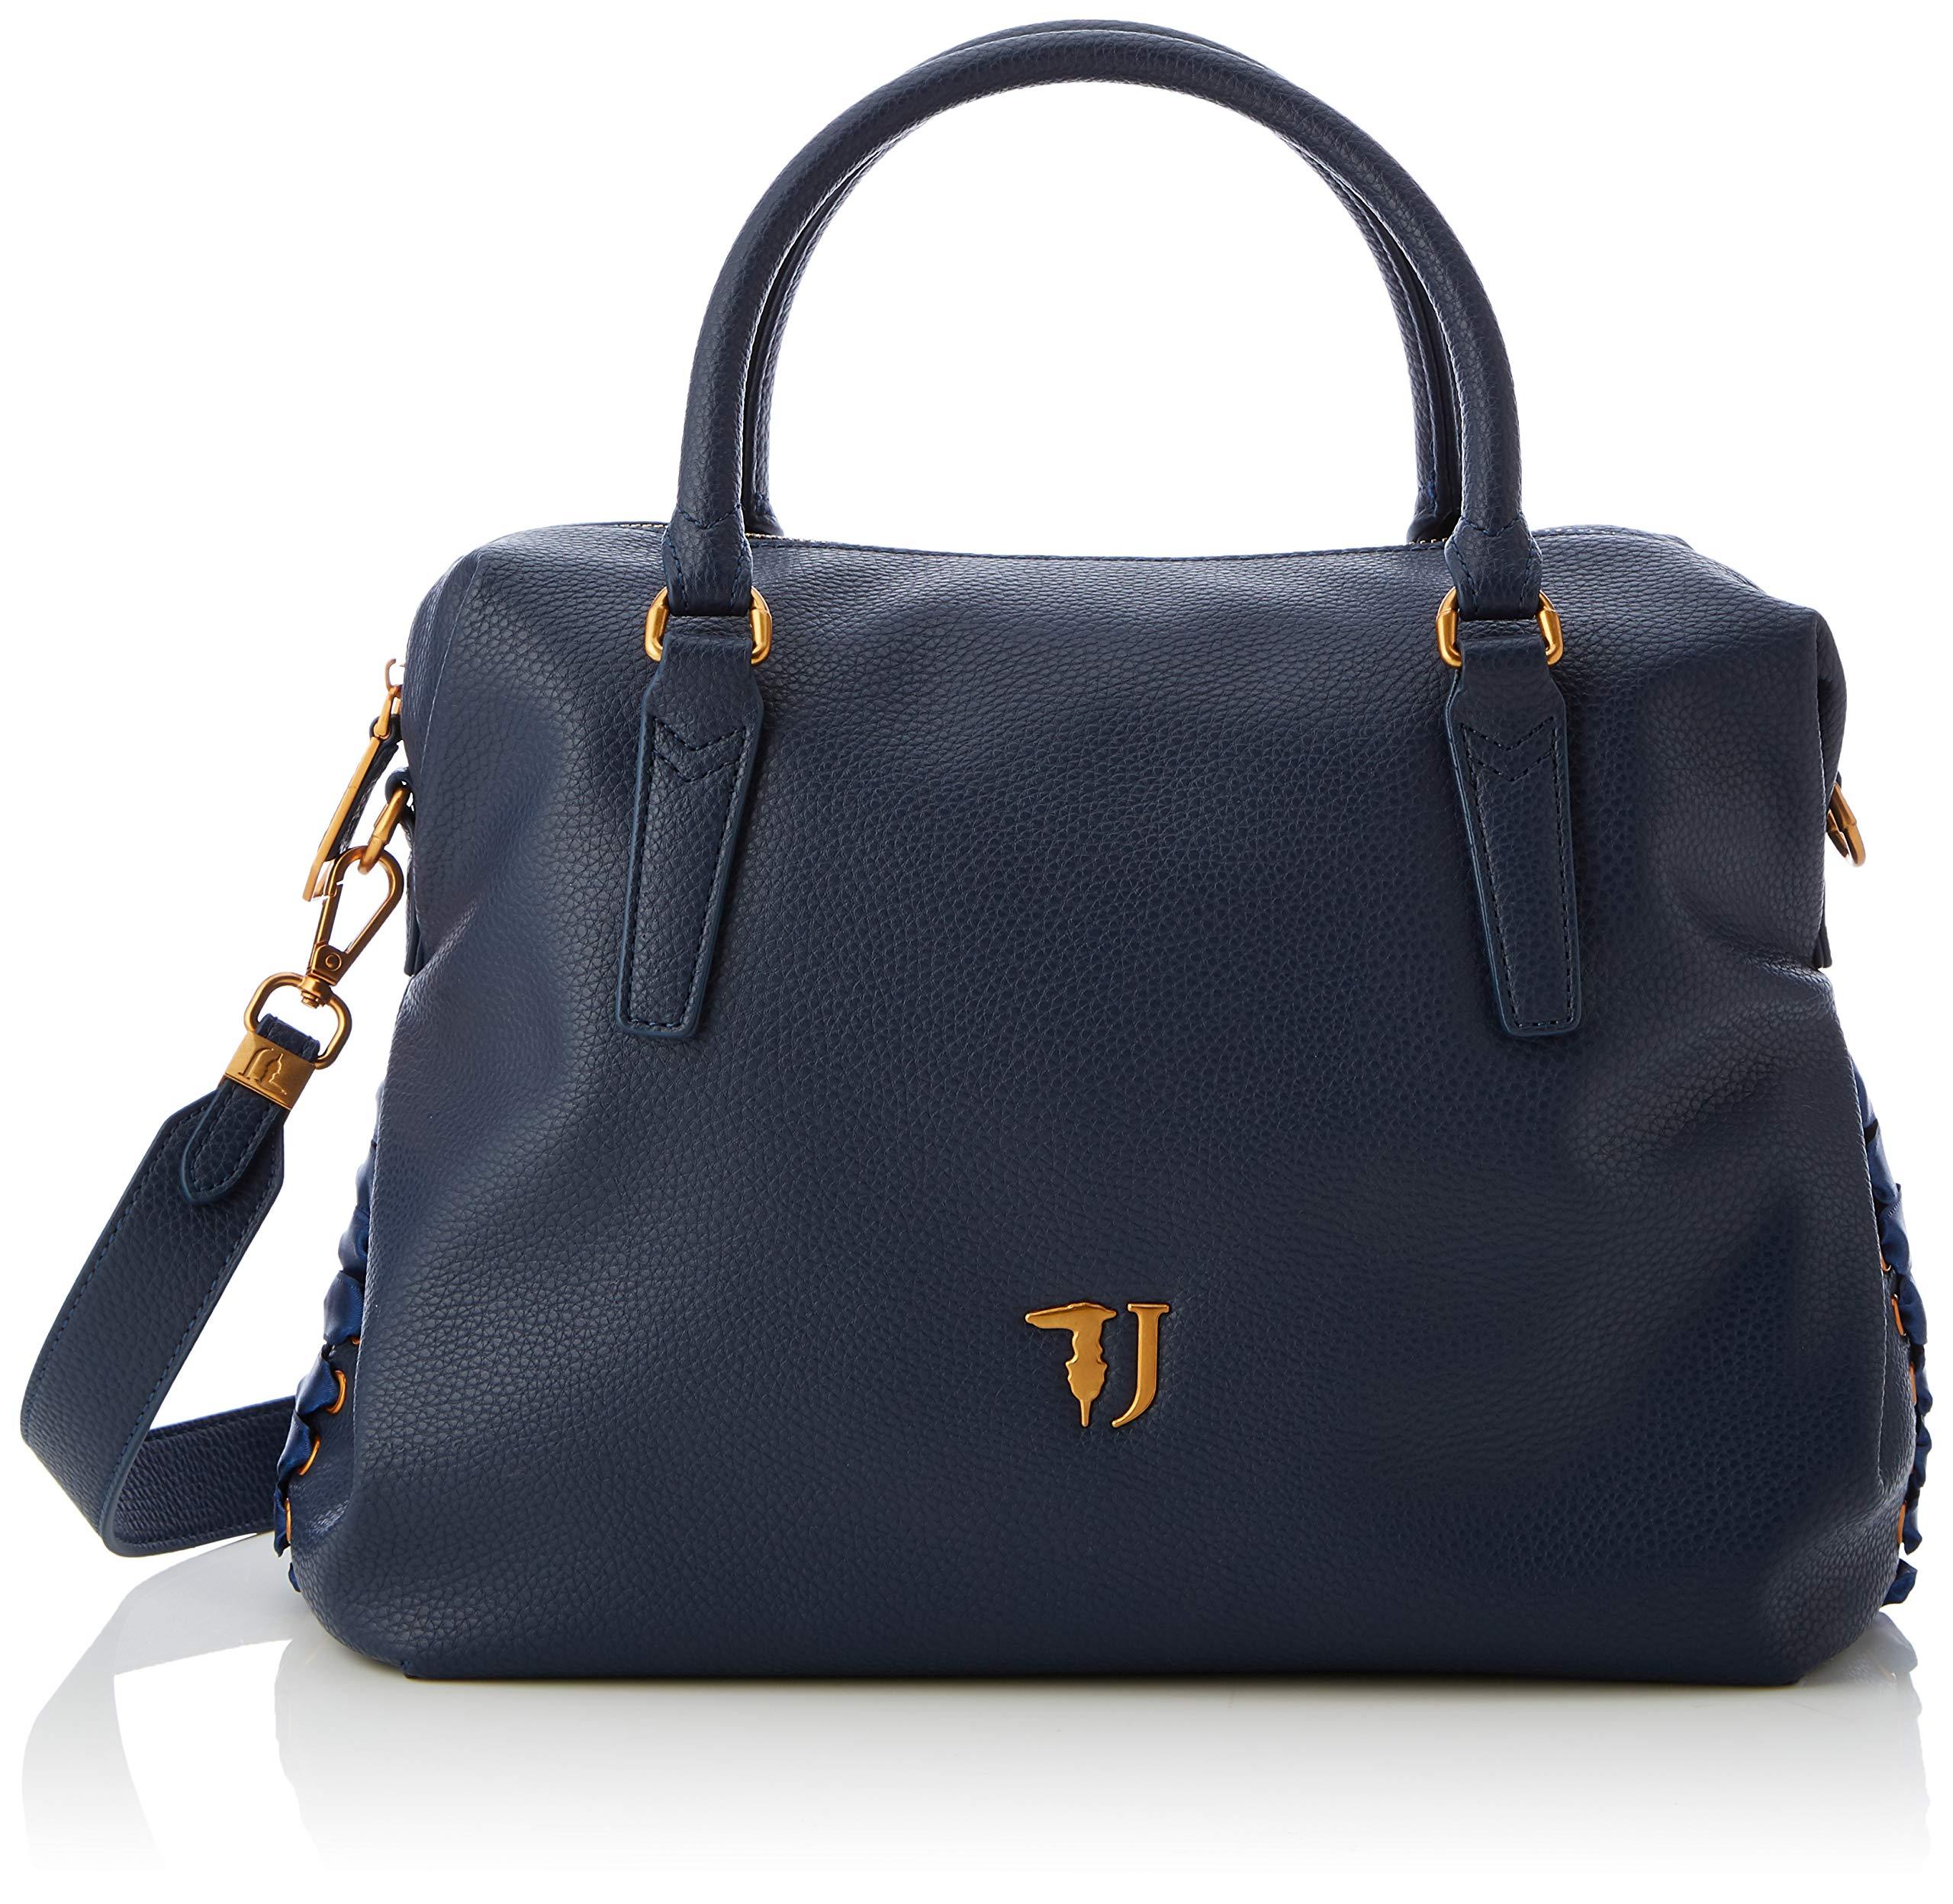 L H Porté X FemmeBleudark Cmw BagSac Main Lavanda Jeans Blue35x22x15 Trussardi Satchel JKFcTl1